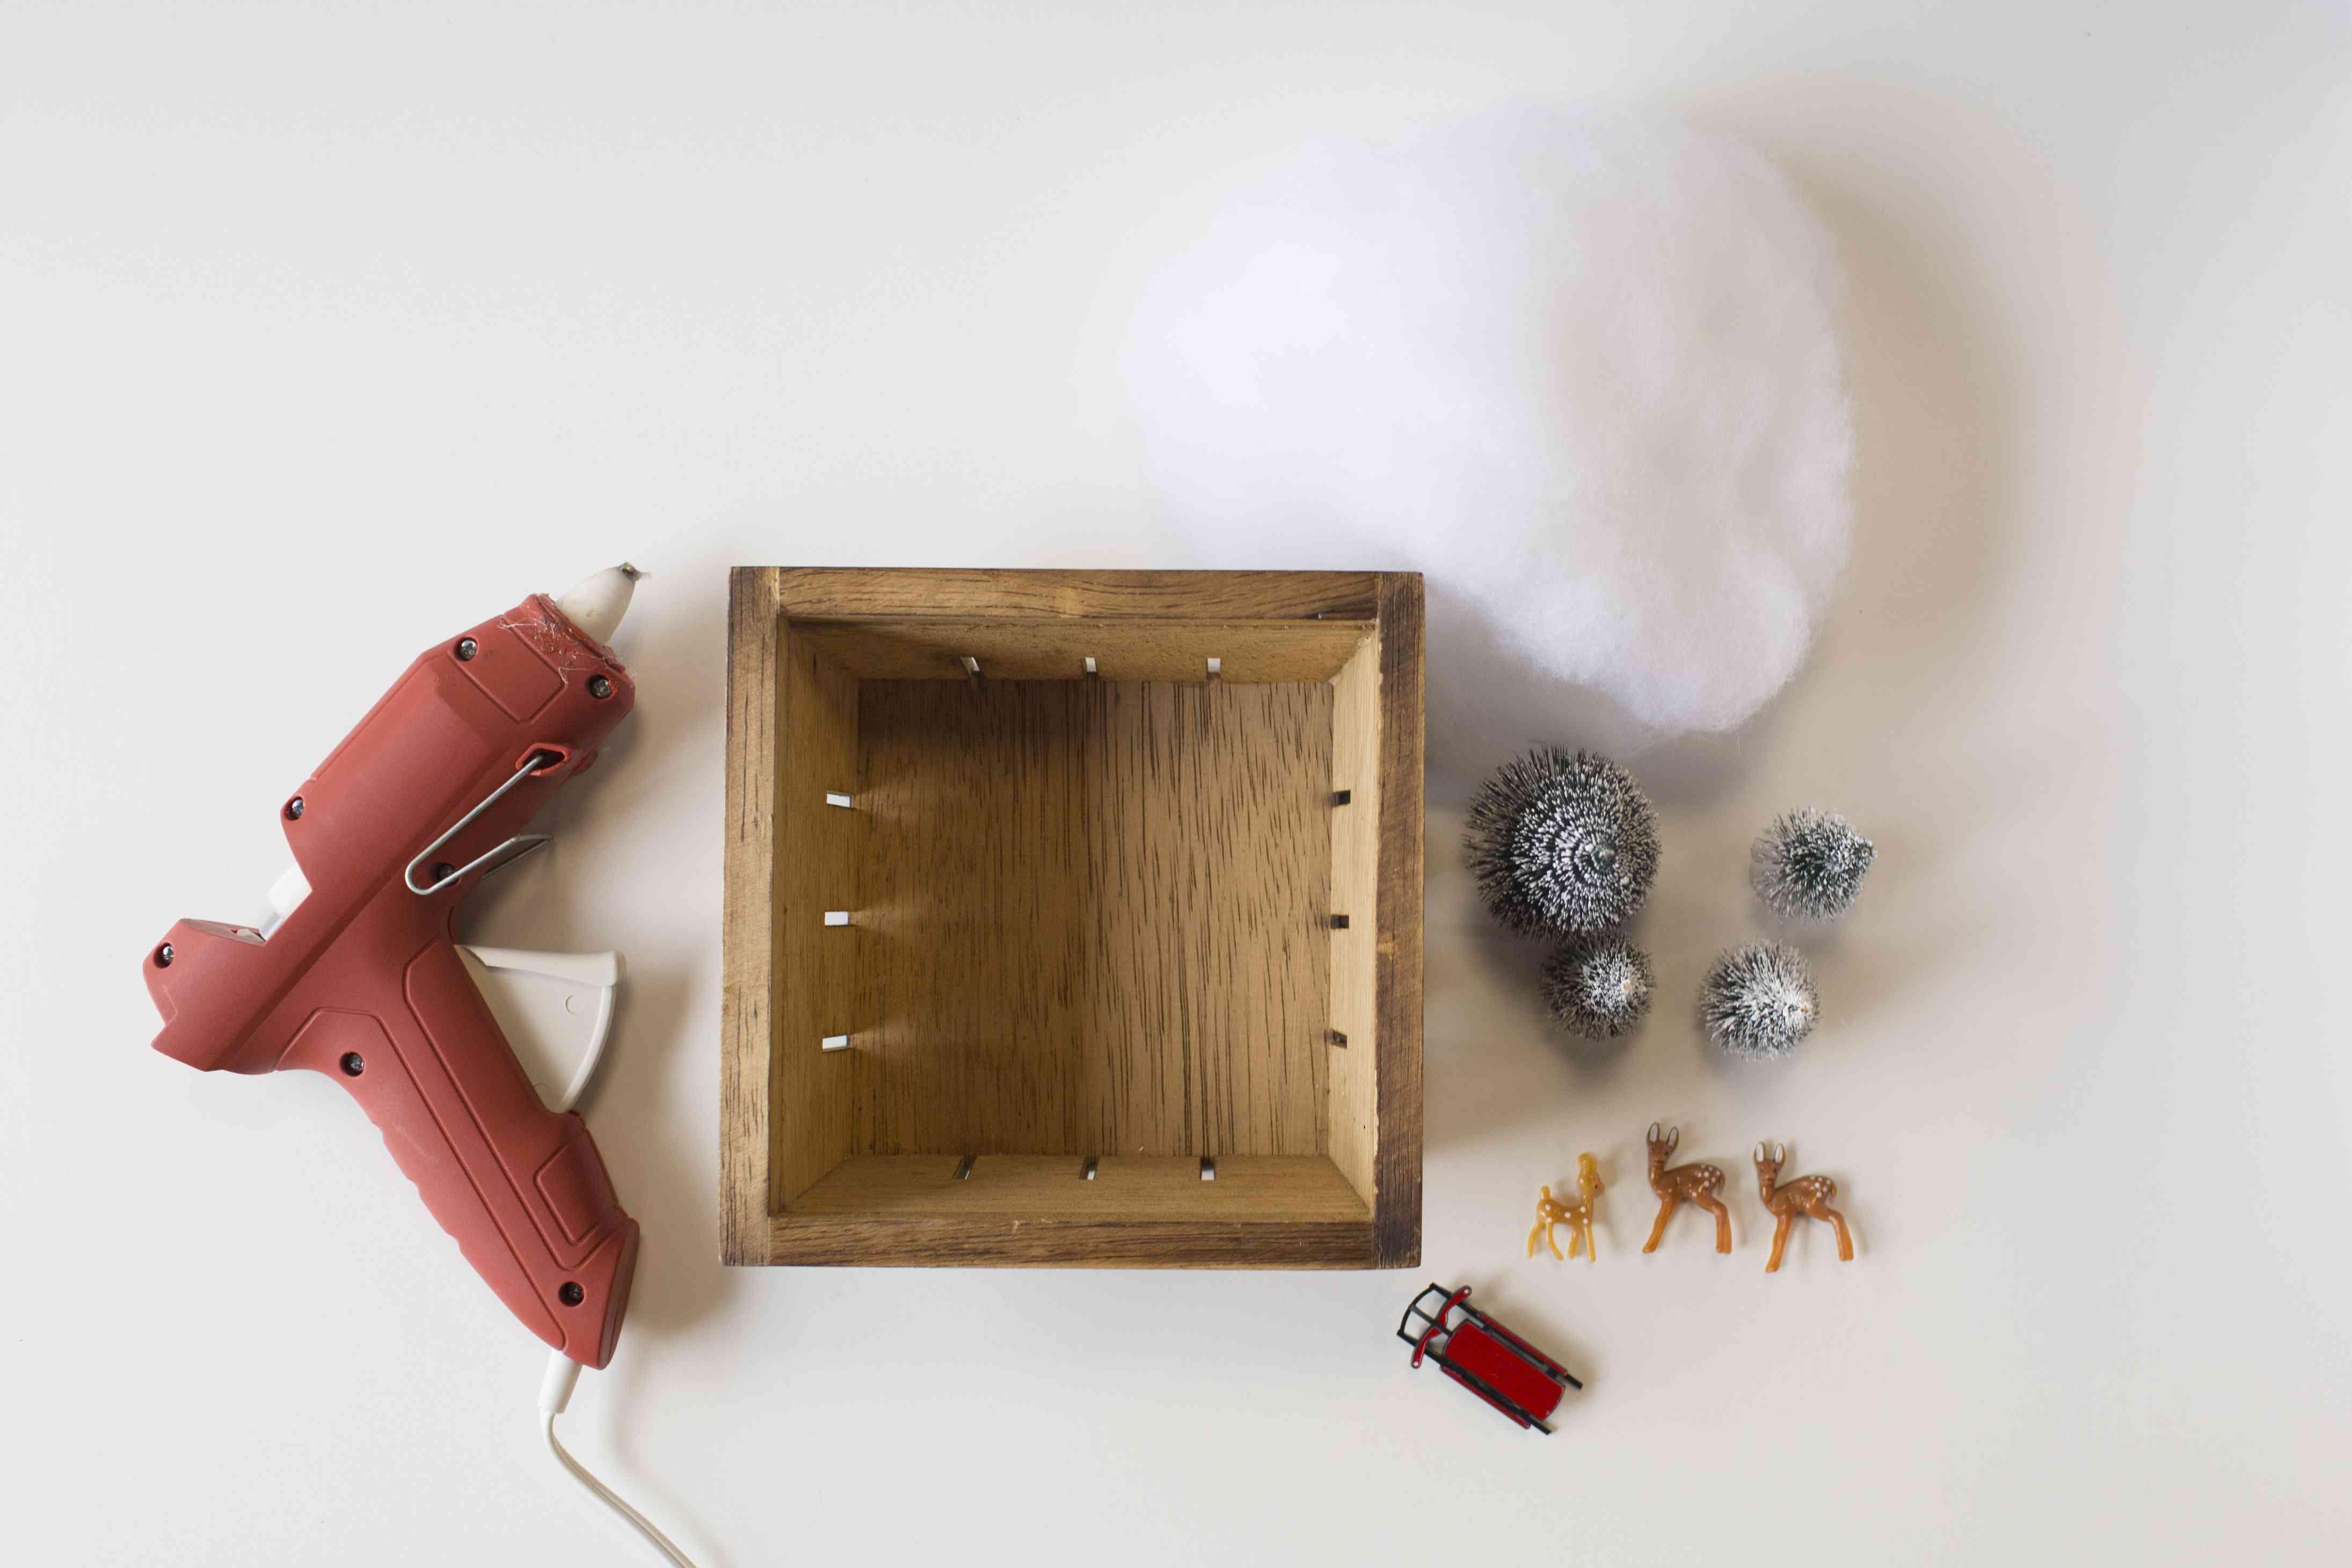 Diorama supplies